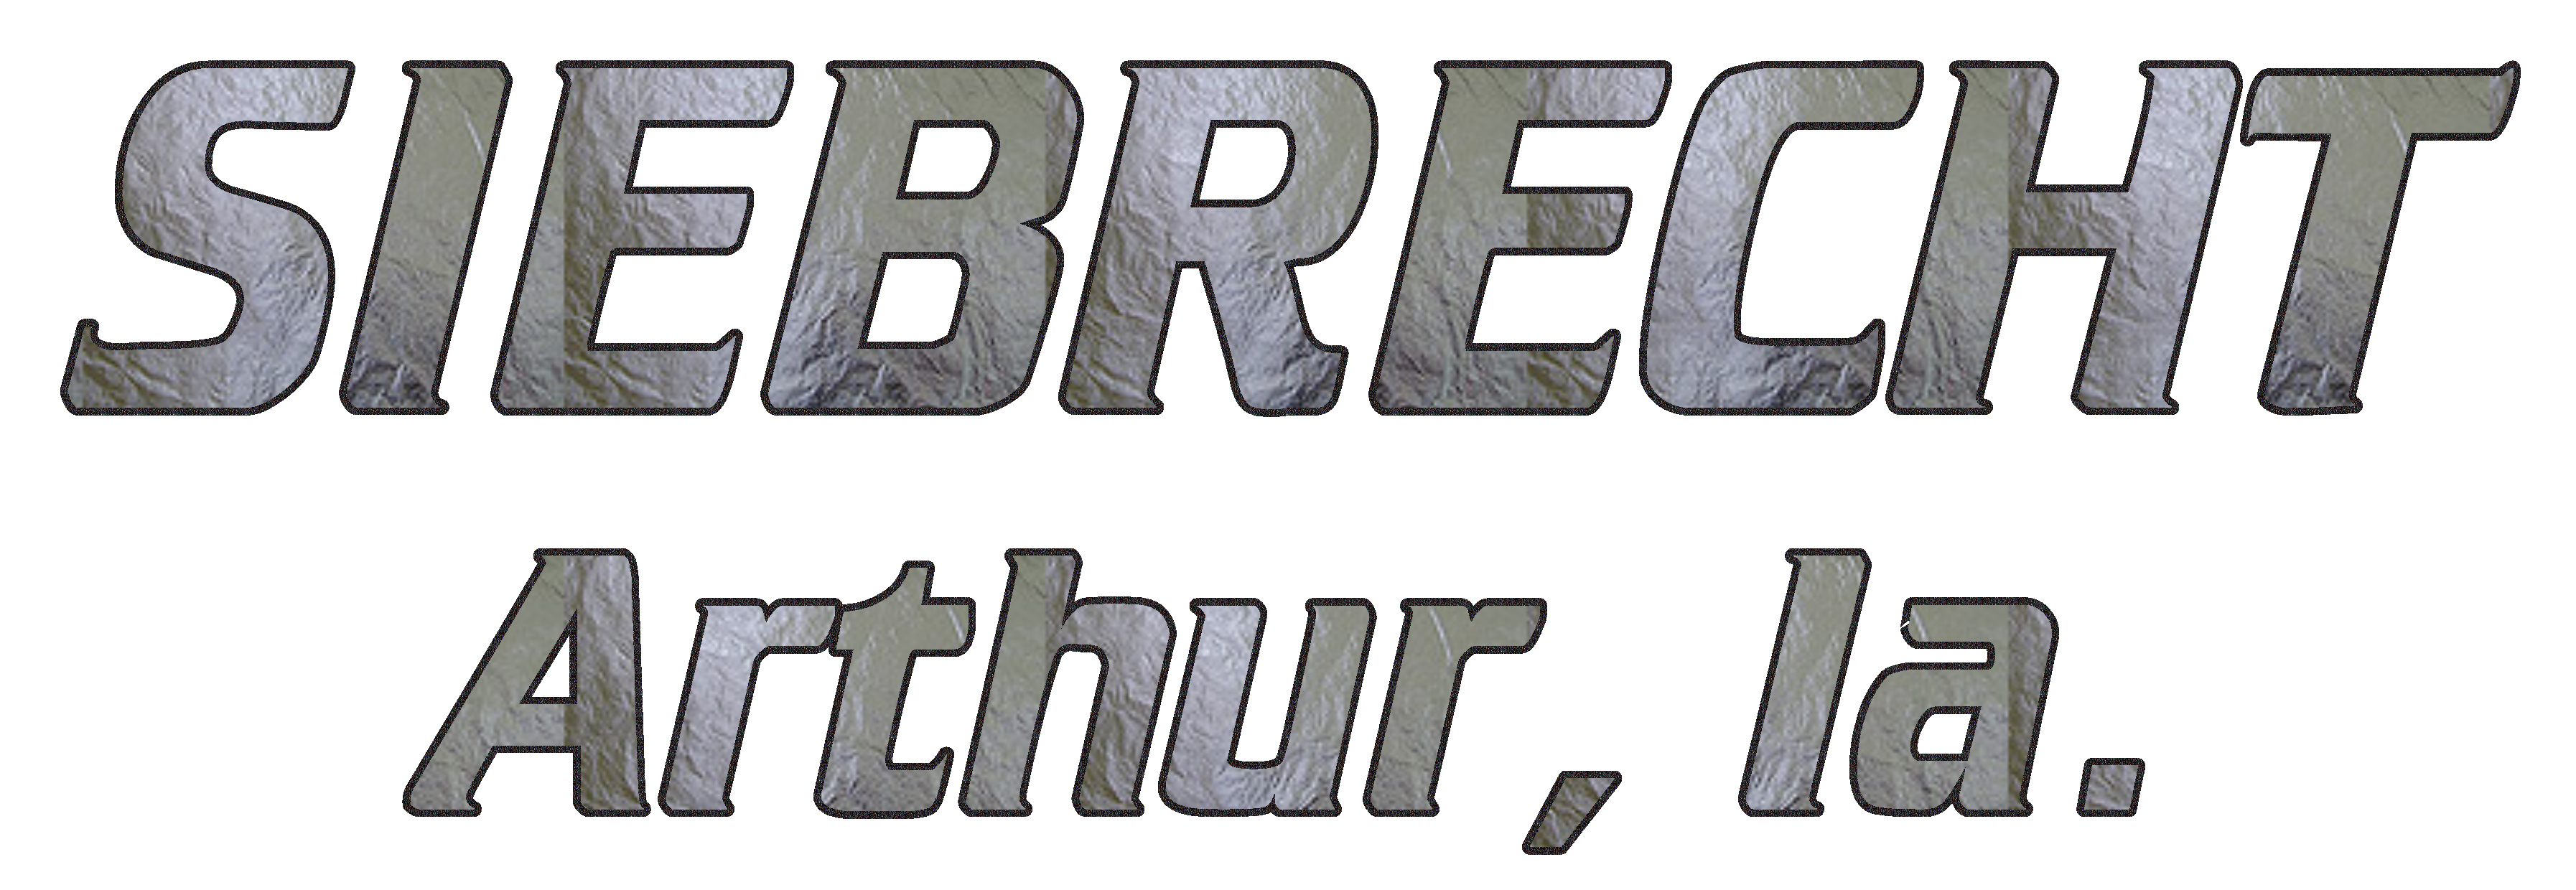 SIEBRECHT TRUCK LETTERING